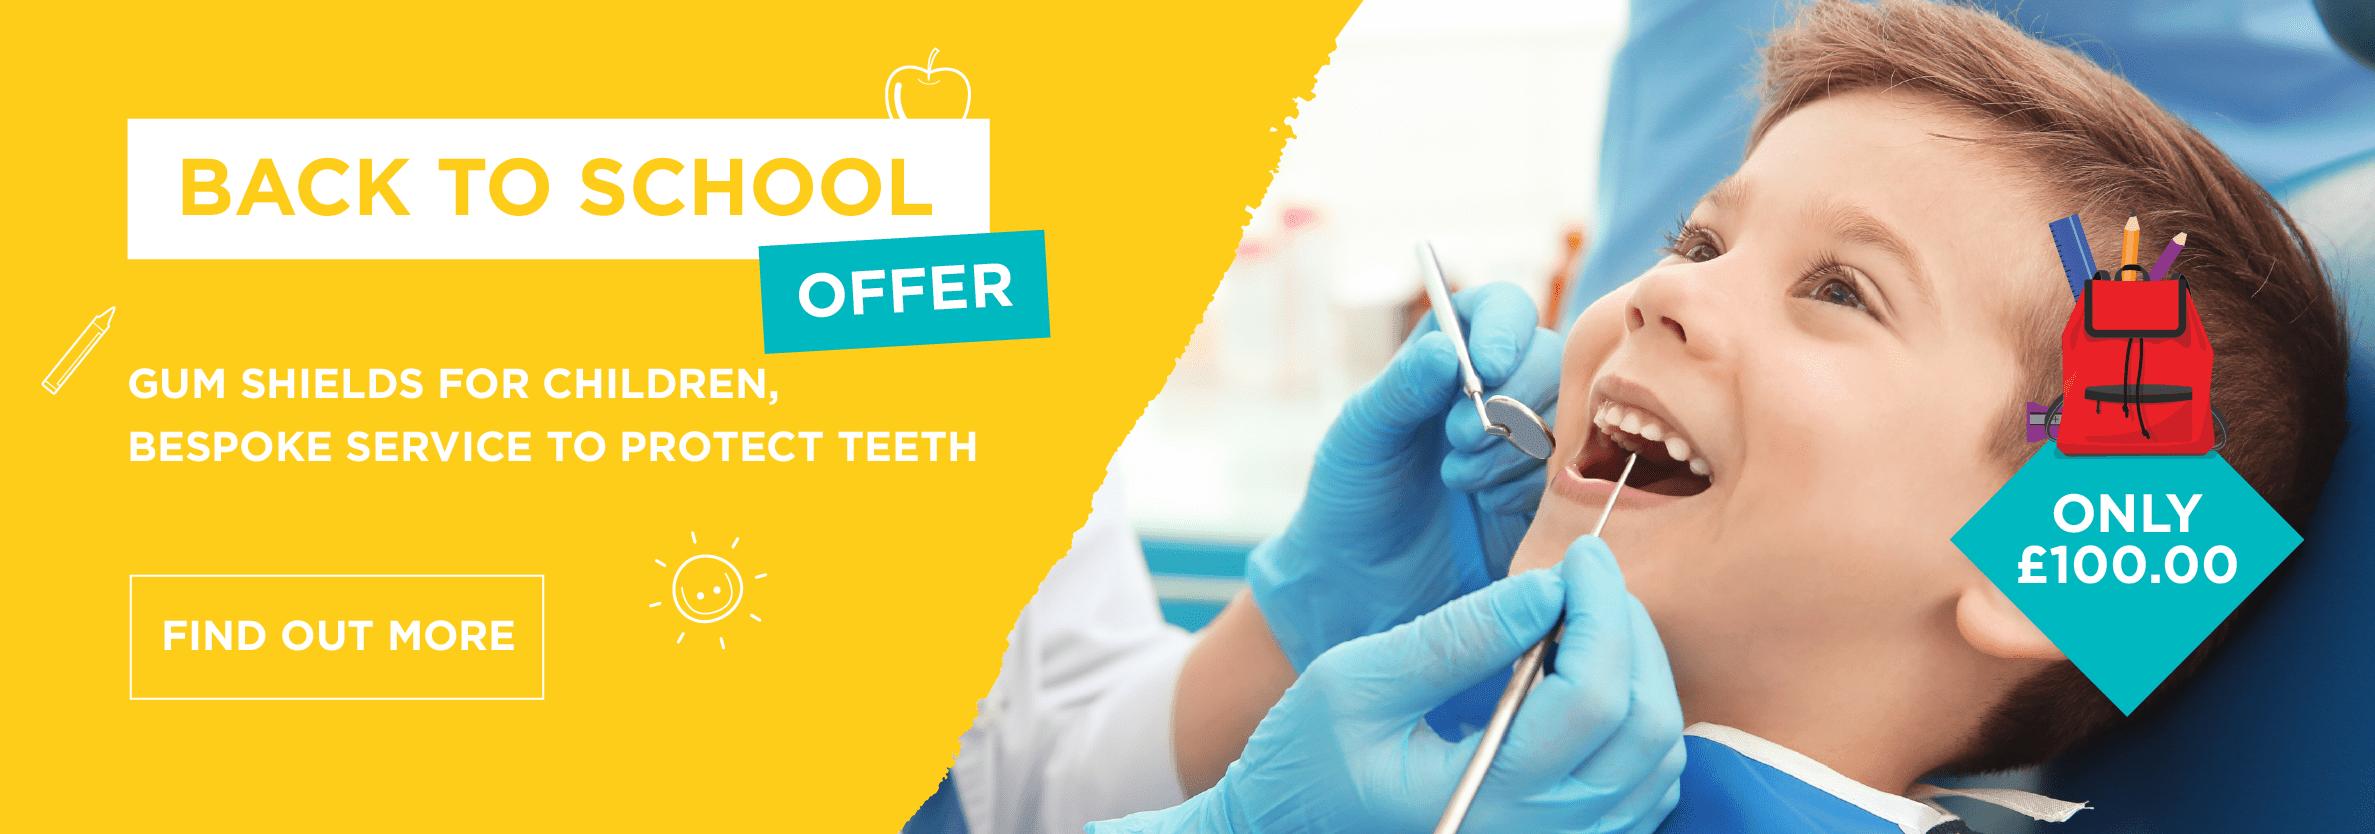 Children's sport mouthguard offer!